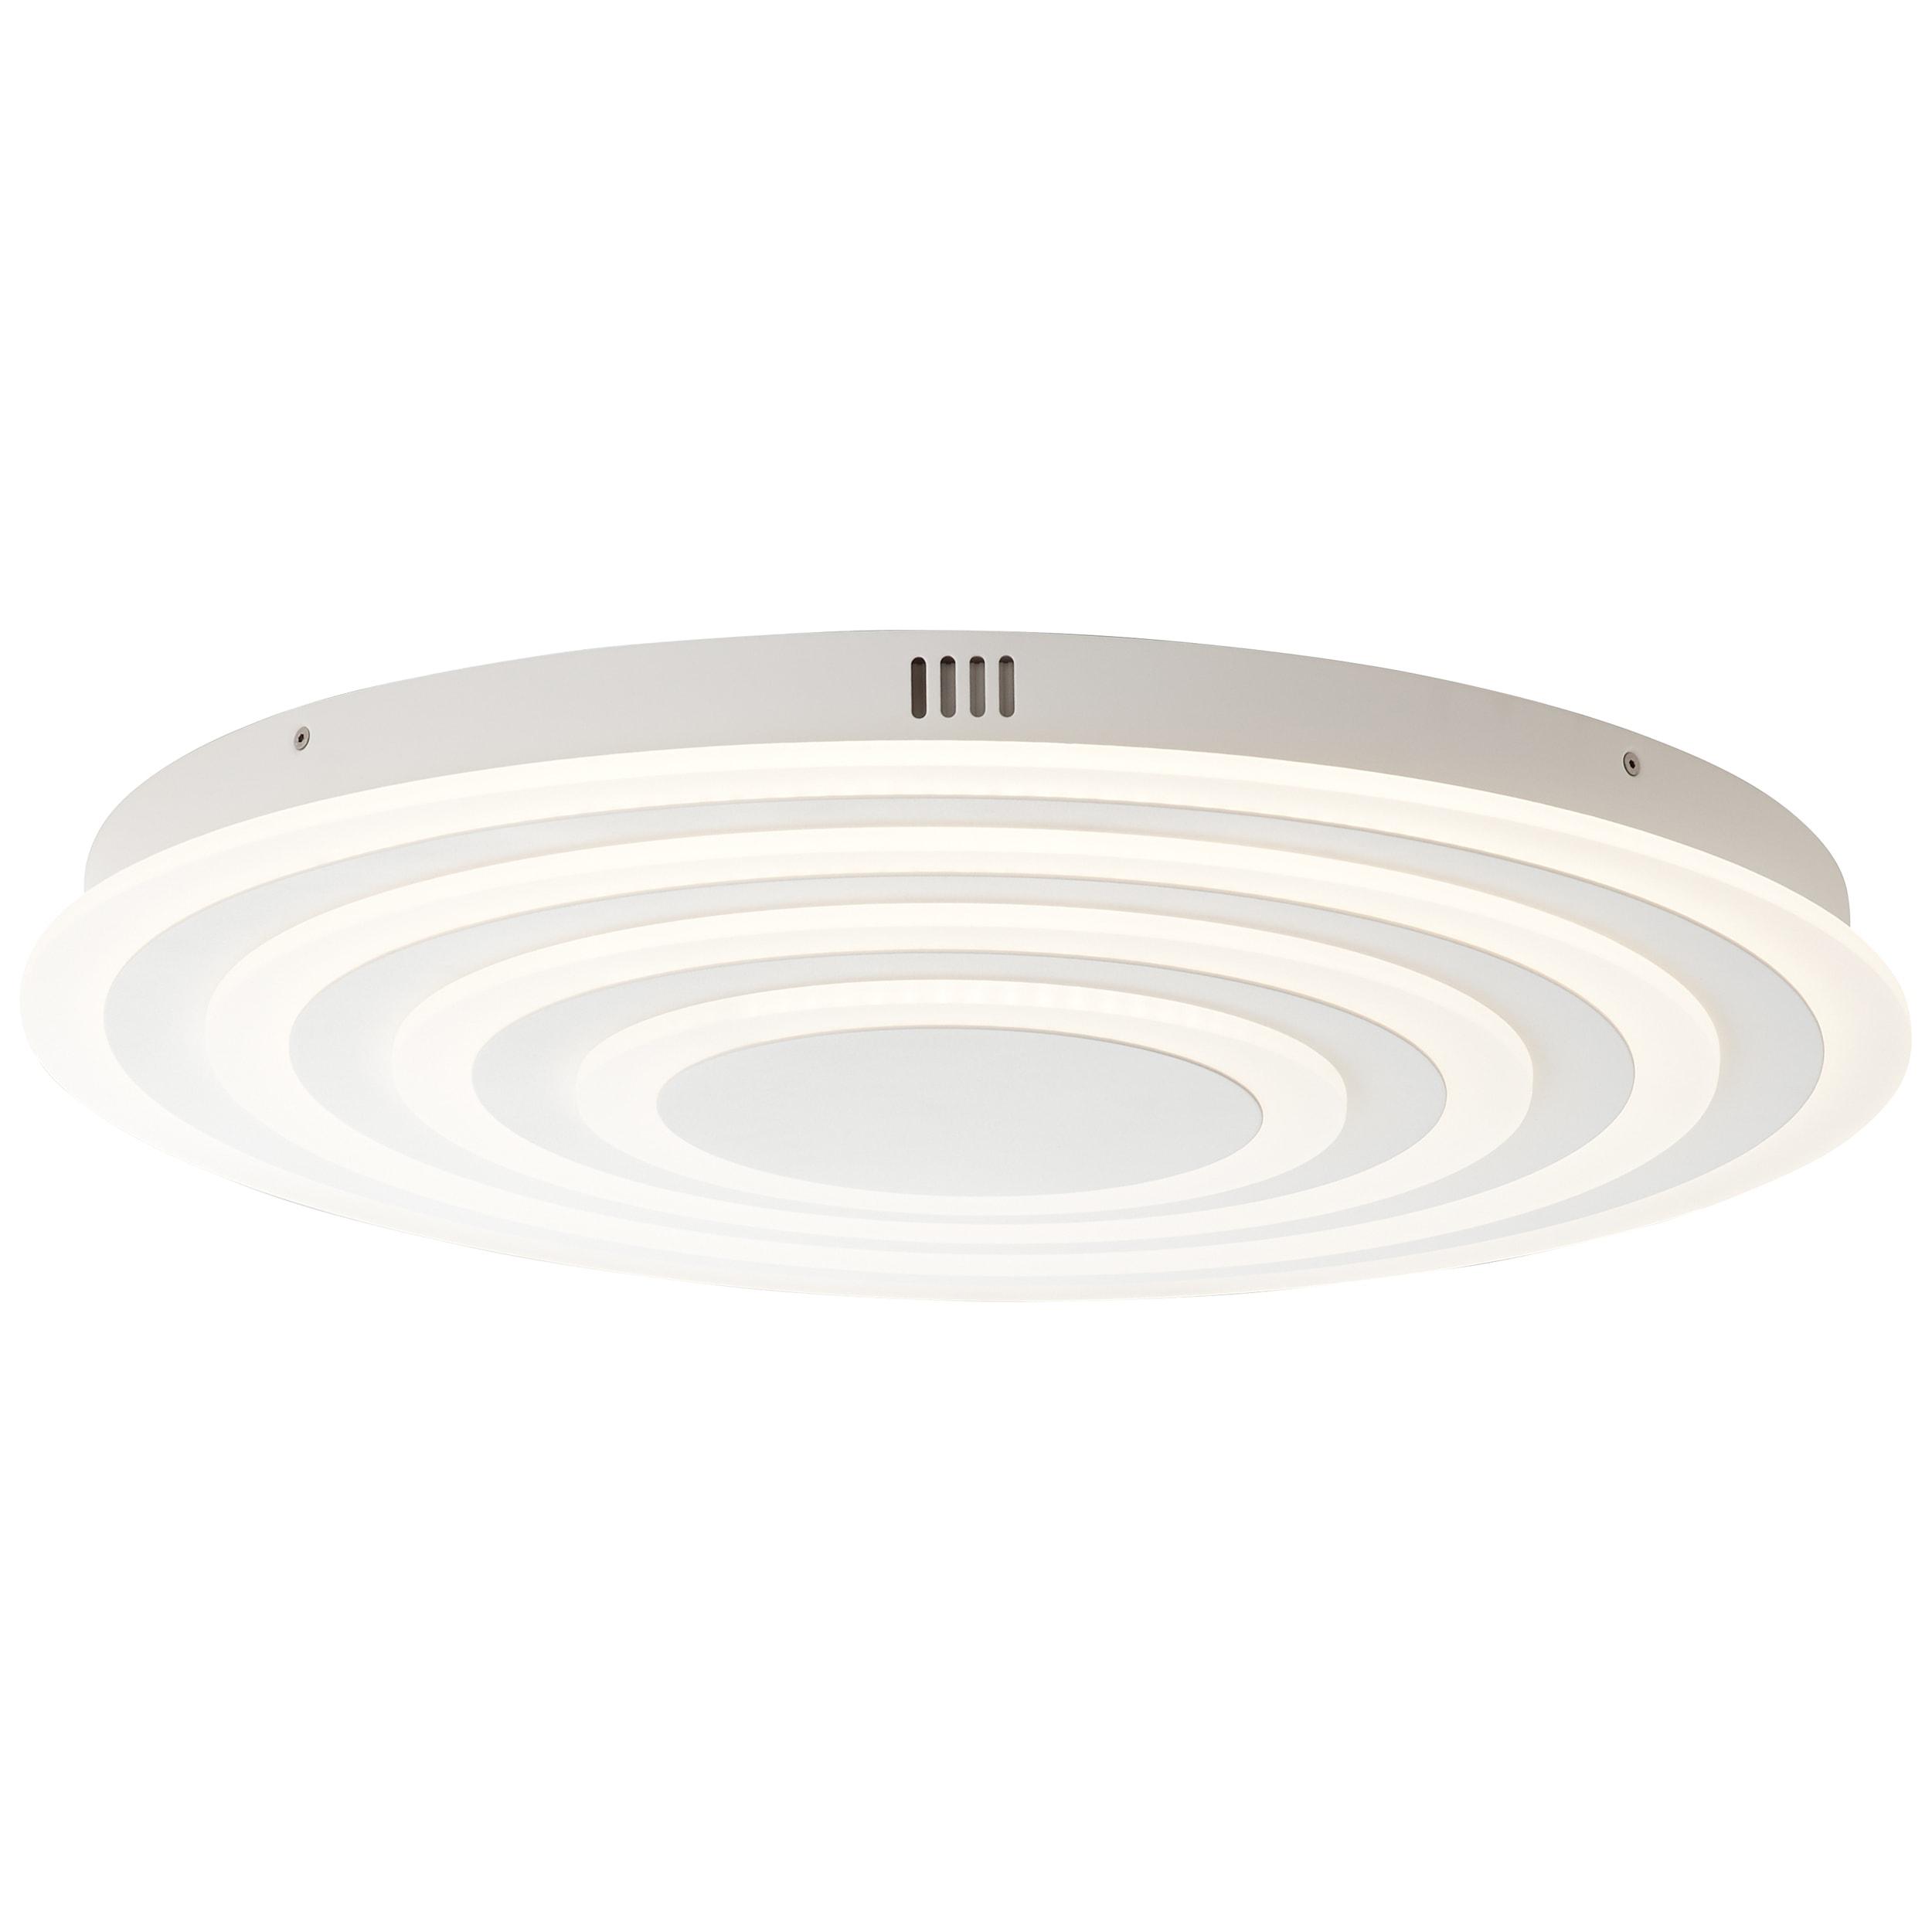 AEG Caresa LED Deckenleuchte 64cm sand/weiß